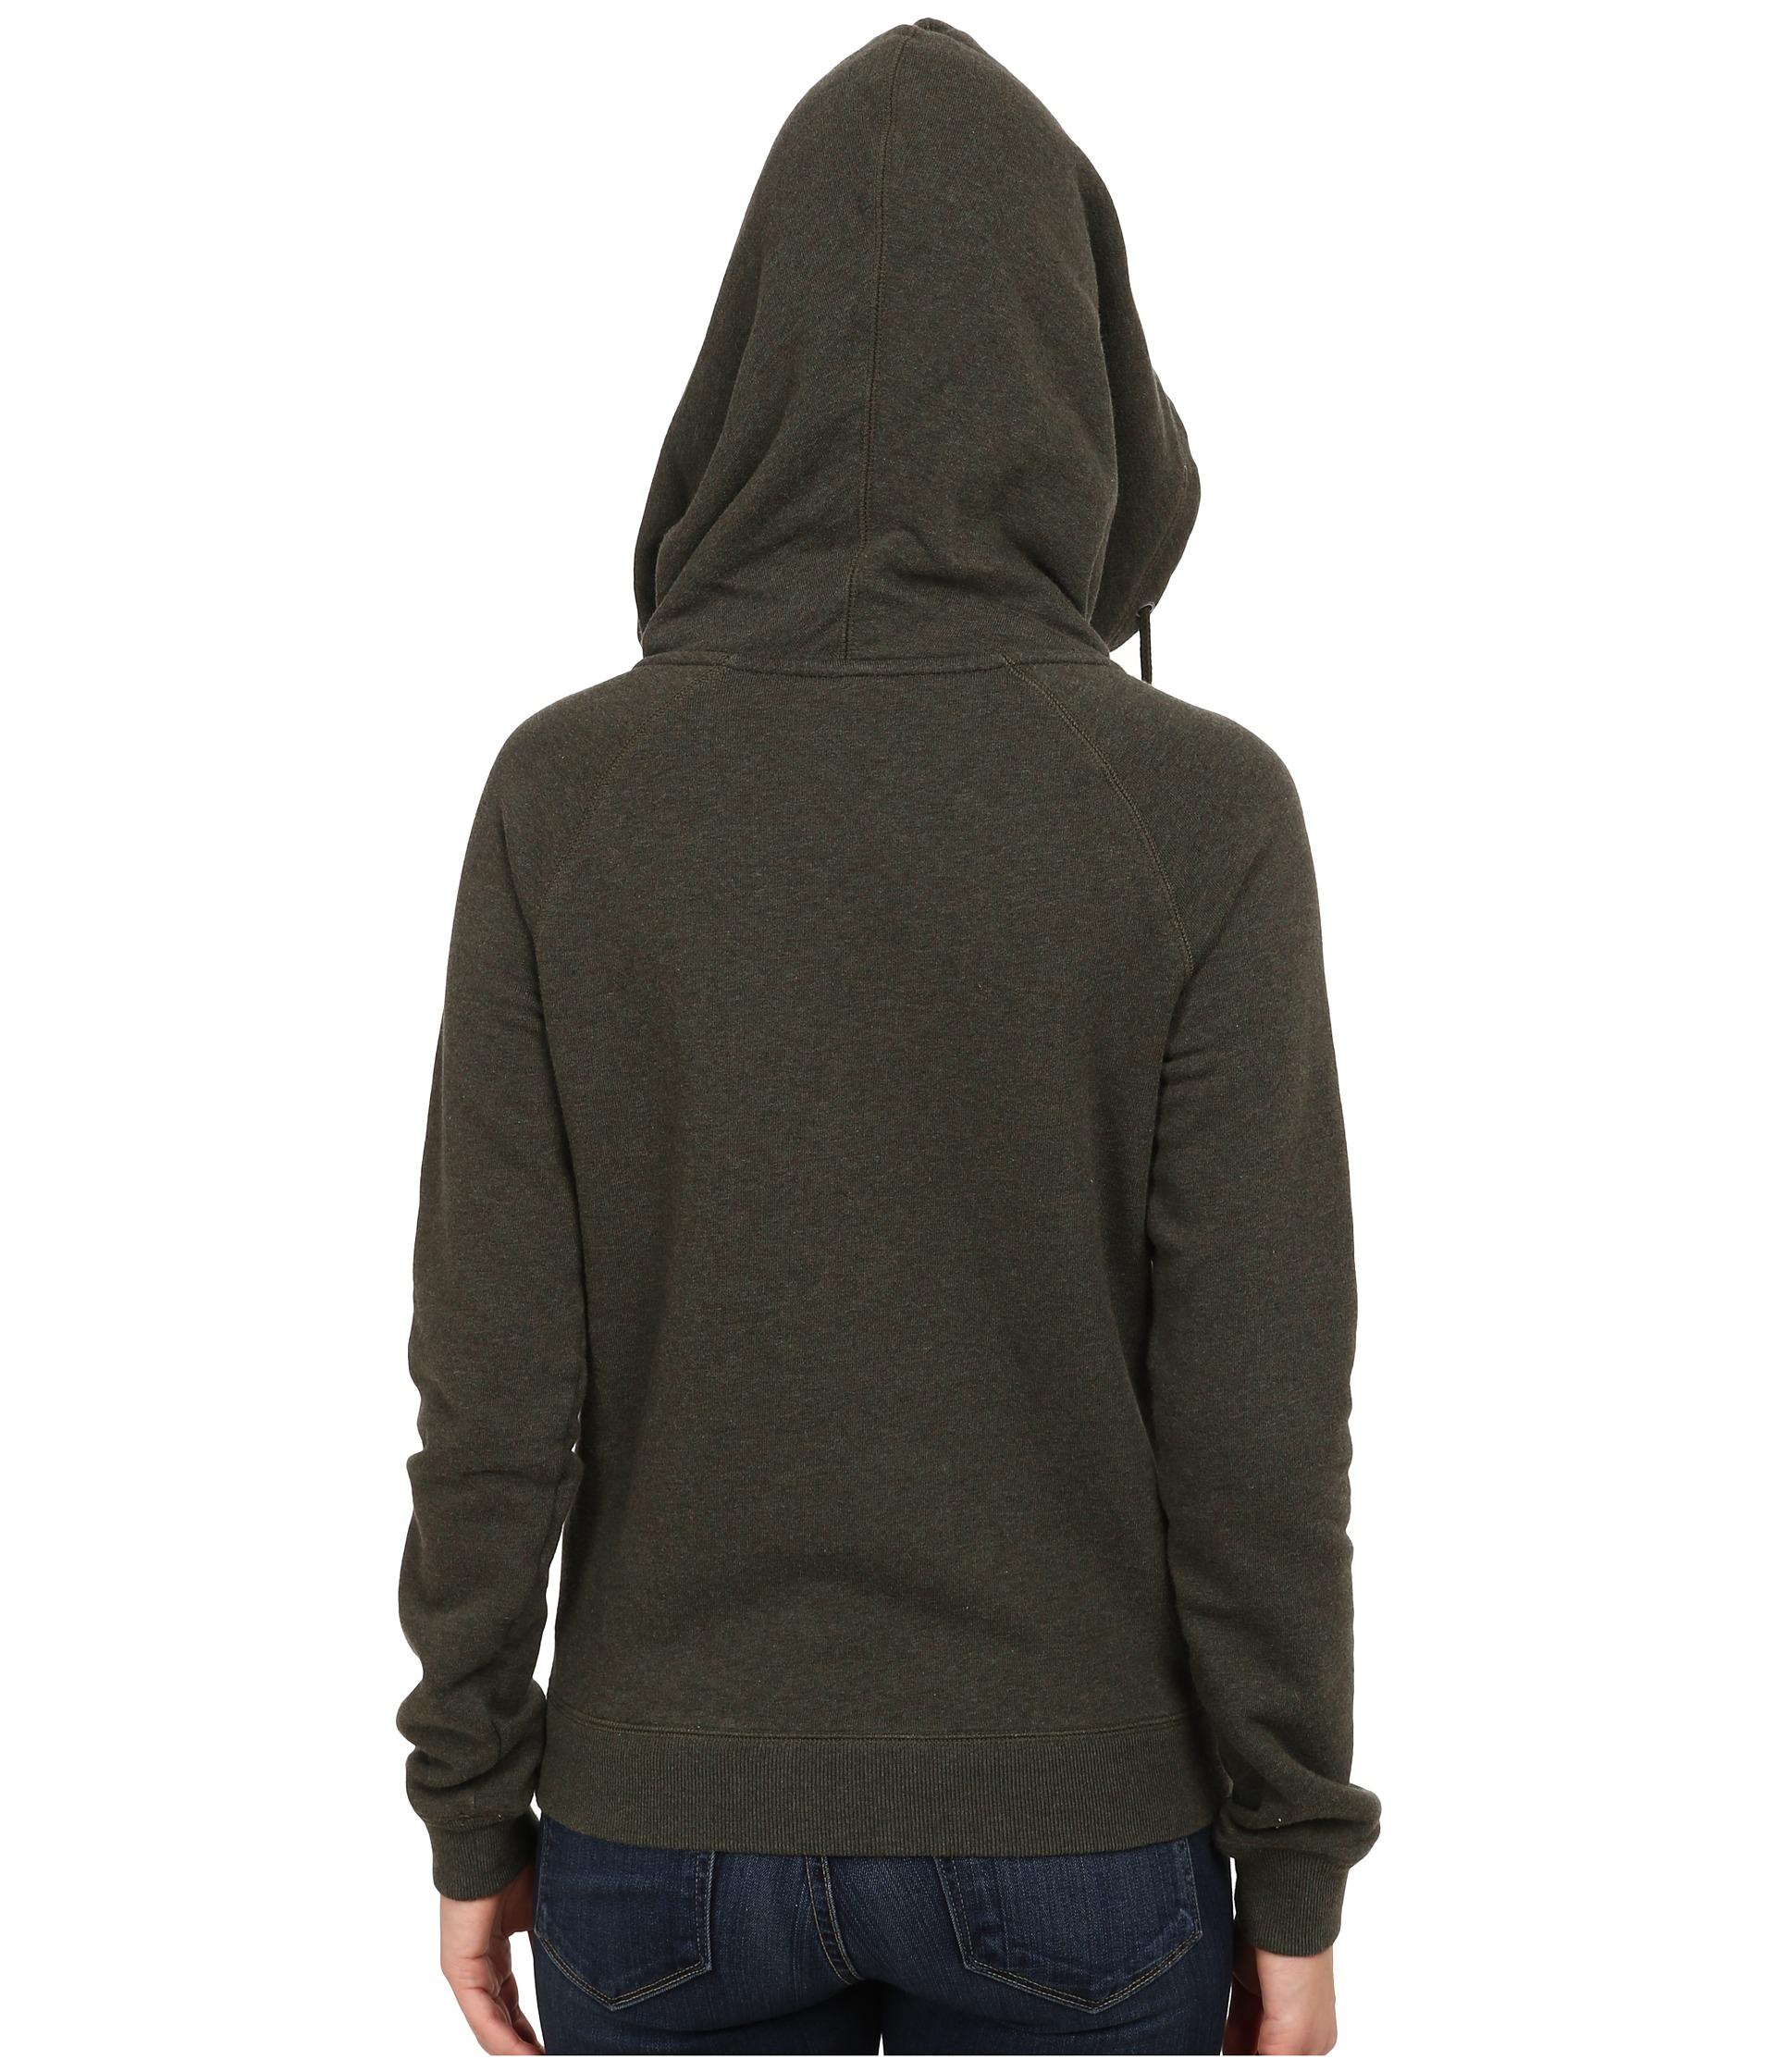 Nike jacket army - Gallery